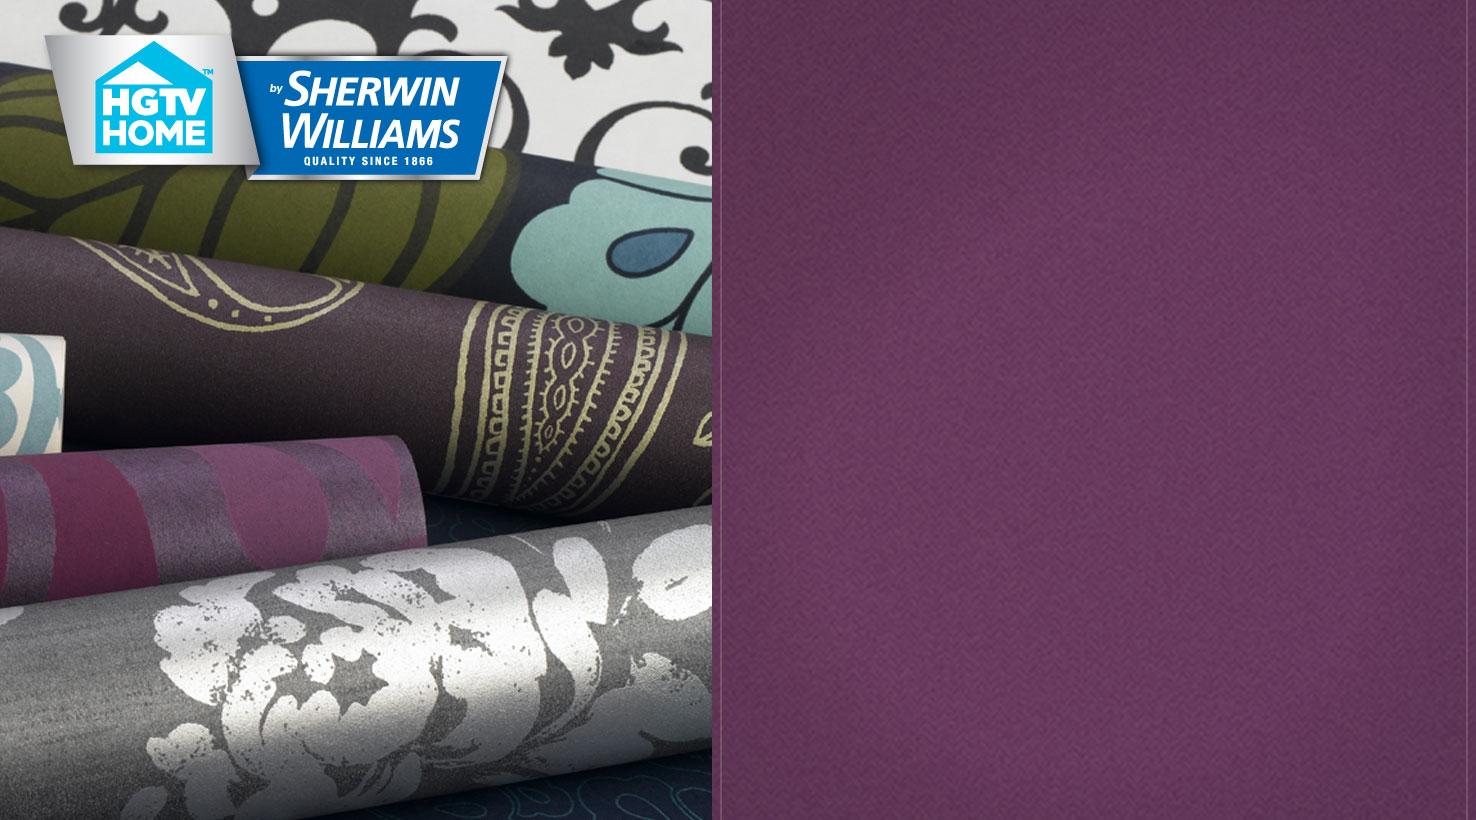 Sherwin Williams Wallpaper Books to Browse - WallpaperSafari